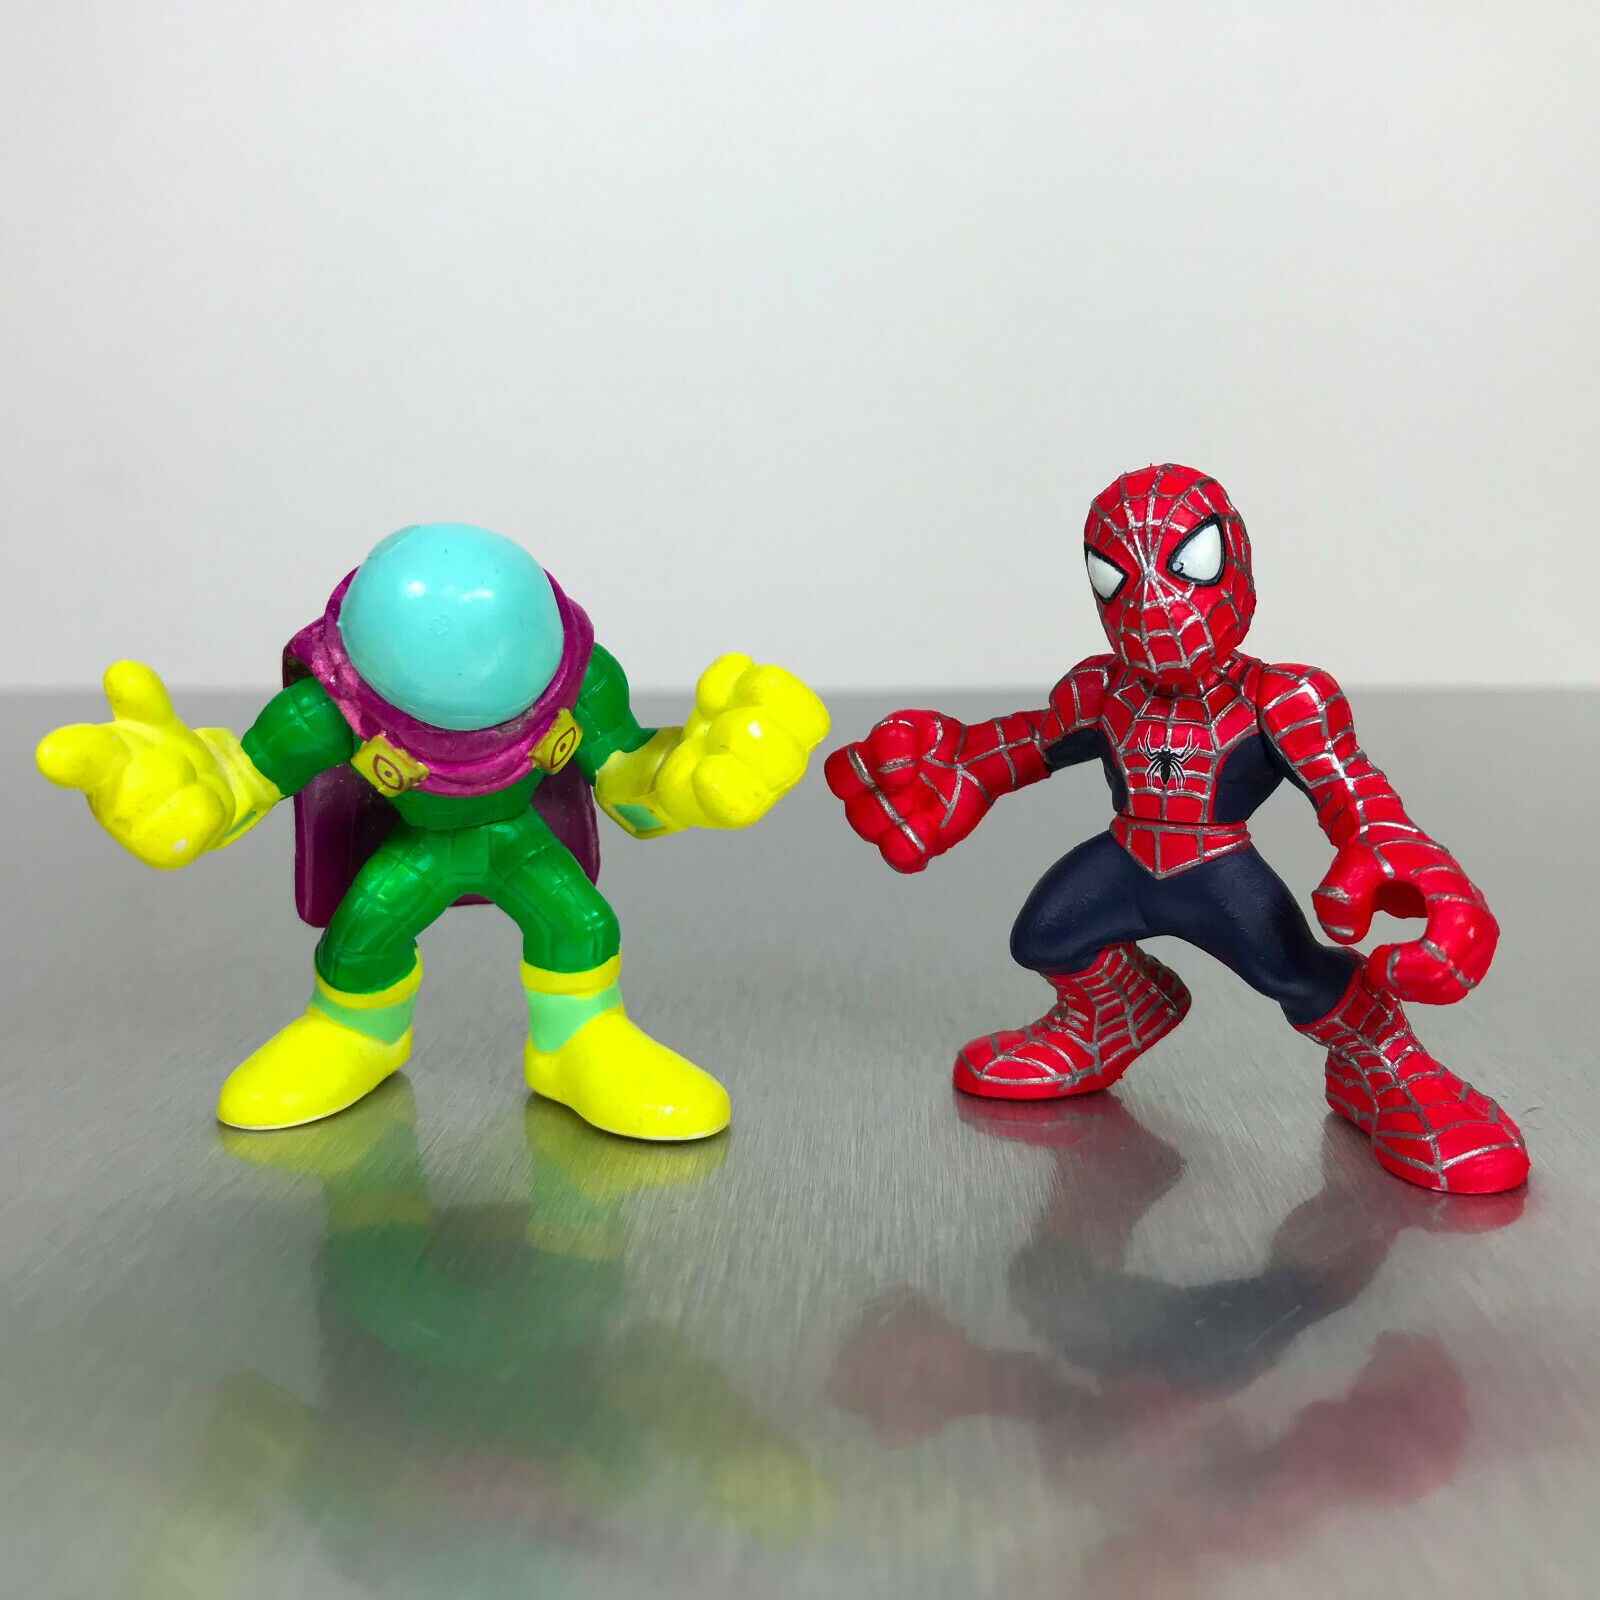 Rare Random 1pcs Hasbro Marvel Squad Heroes SpiderMan Spider Man Stunt City